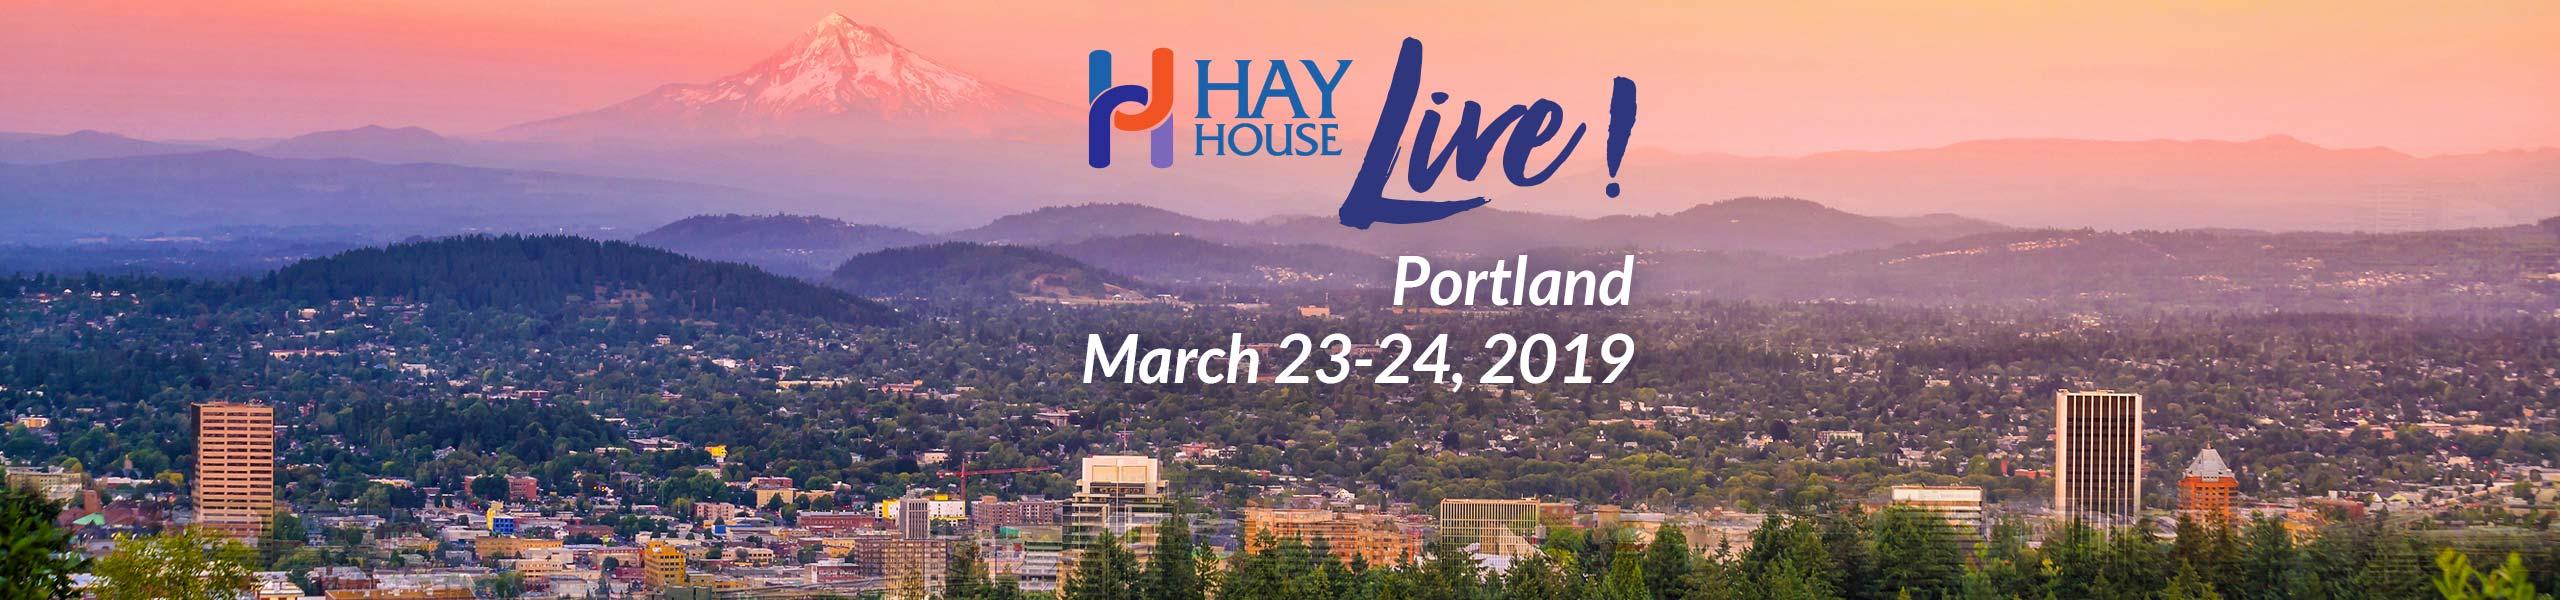 Hay House Live! Portland 2019 - Sonia Choquette